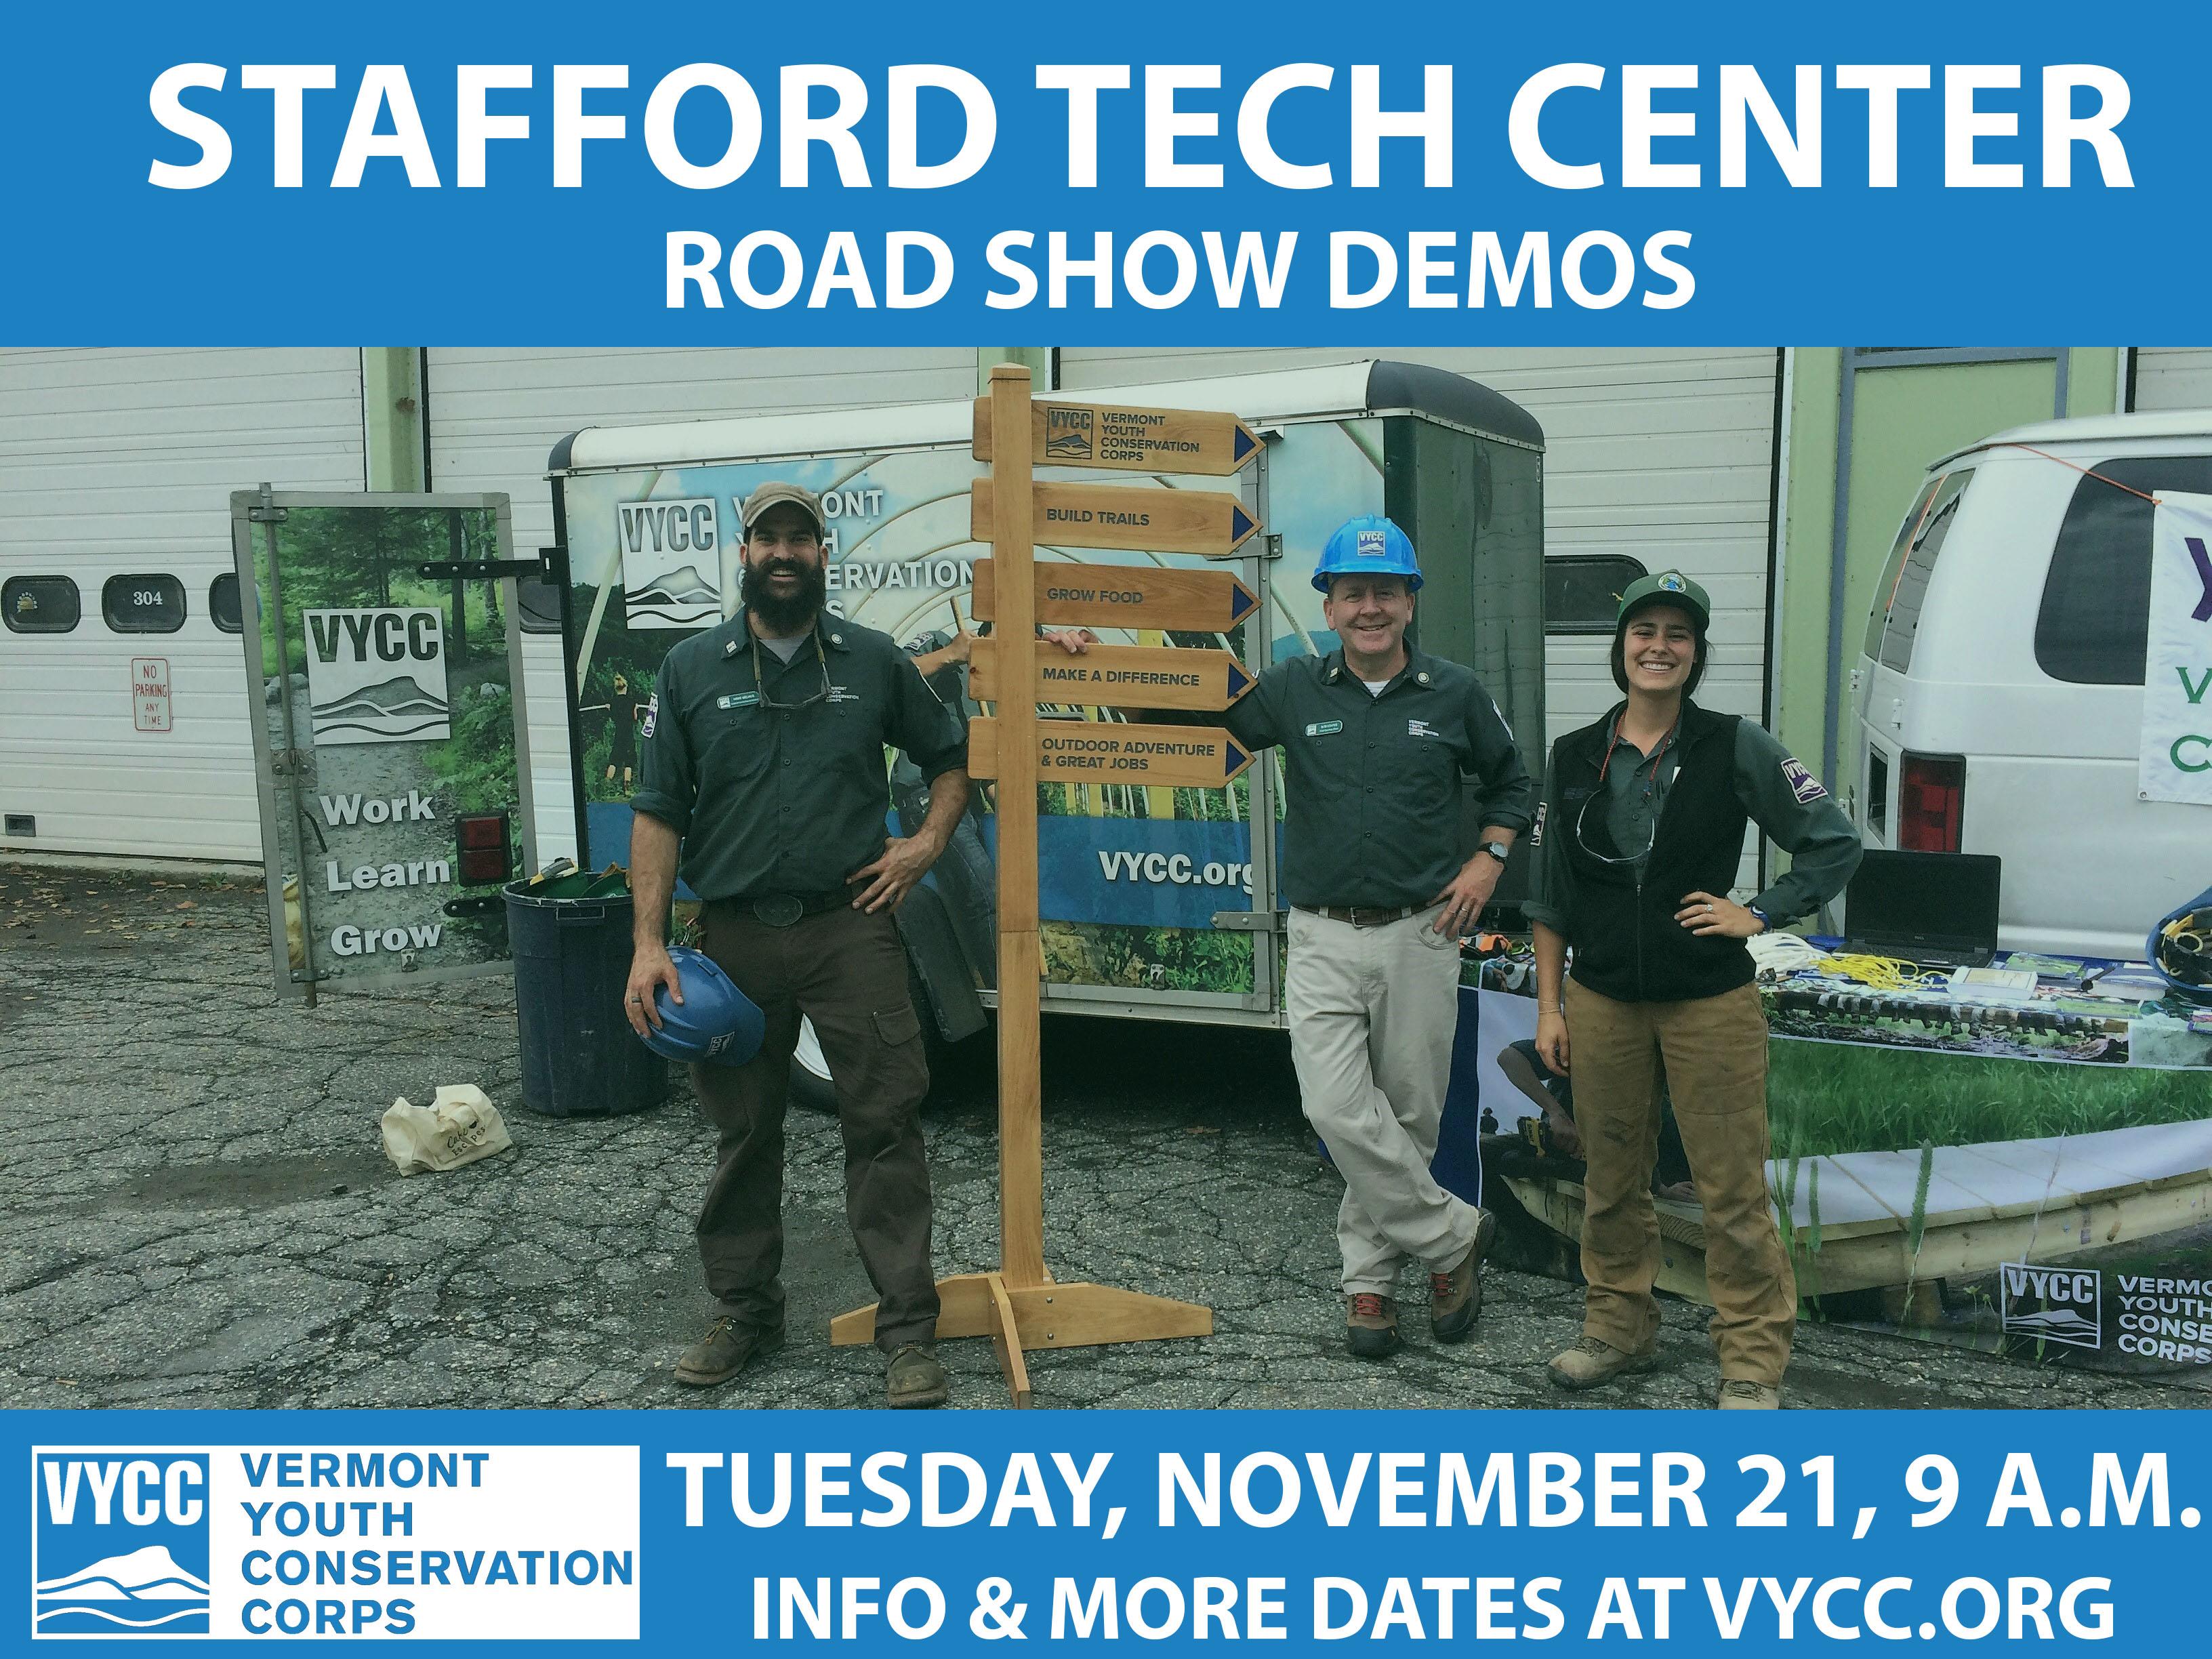 The VYCC Road Show Demos: Stafford Technical Center